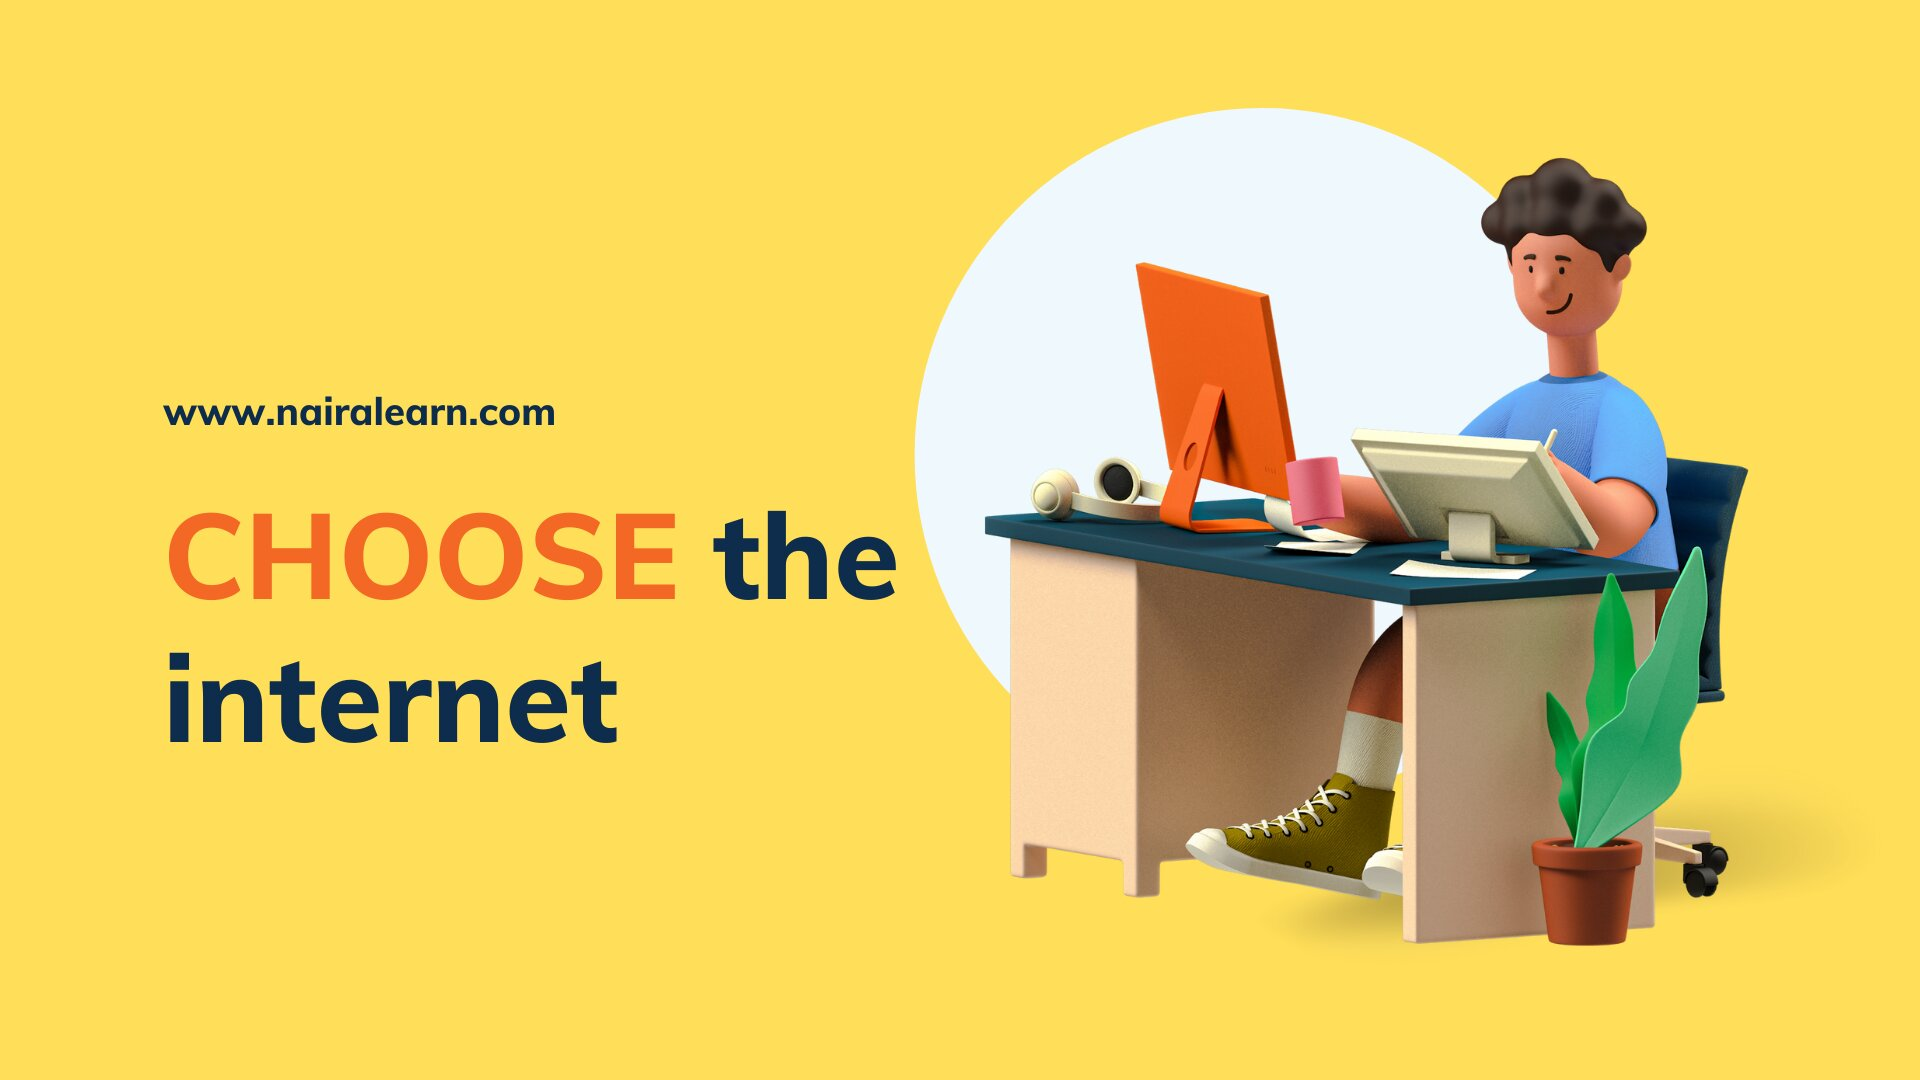 Choose the internet